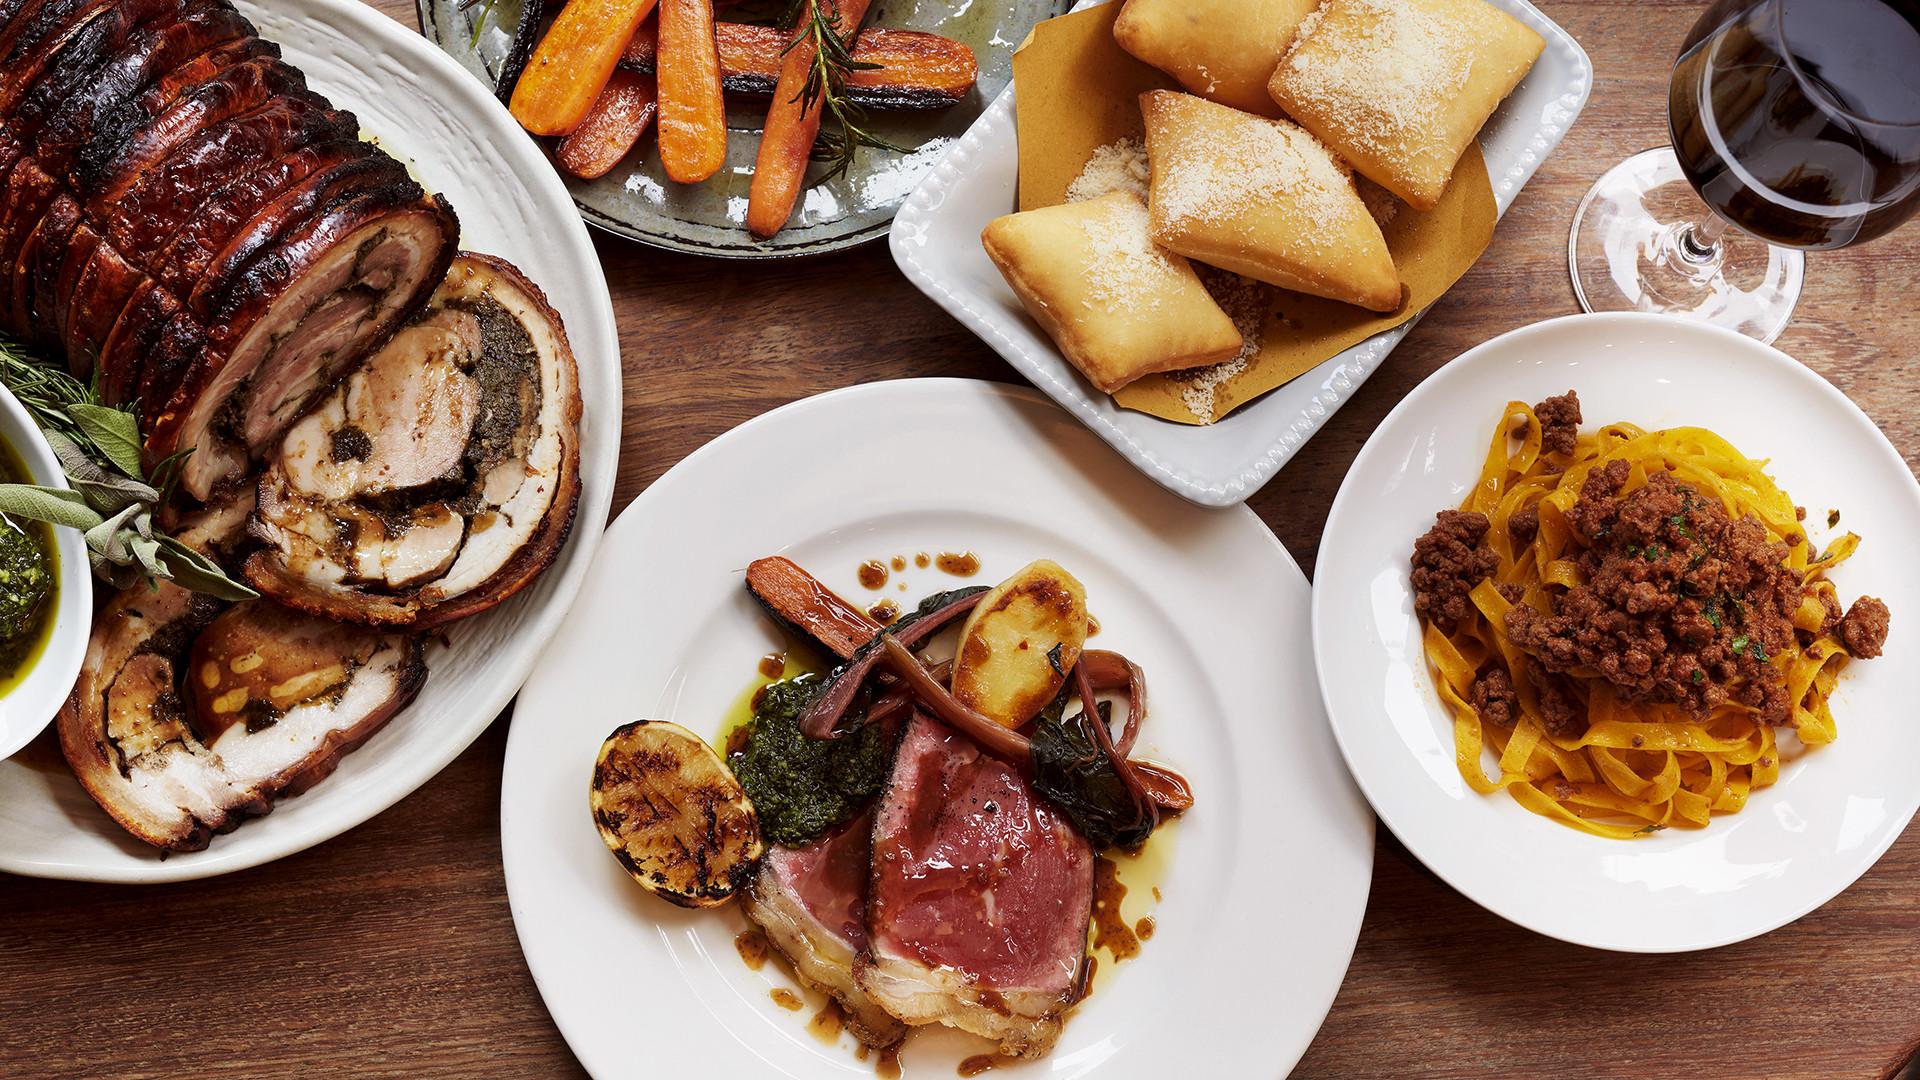 Mele e Pere's Sunday Roast all'Italiana